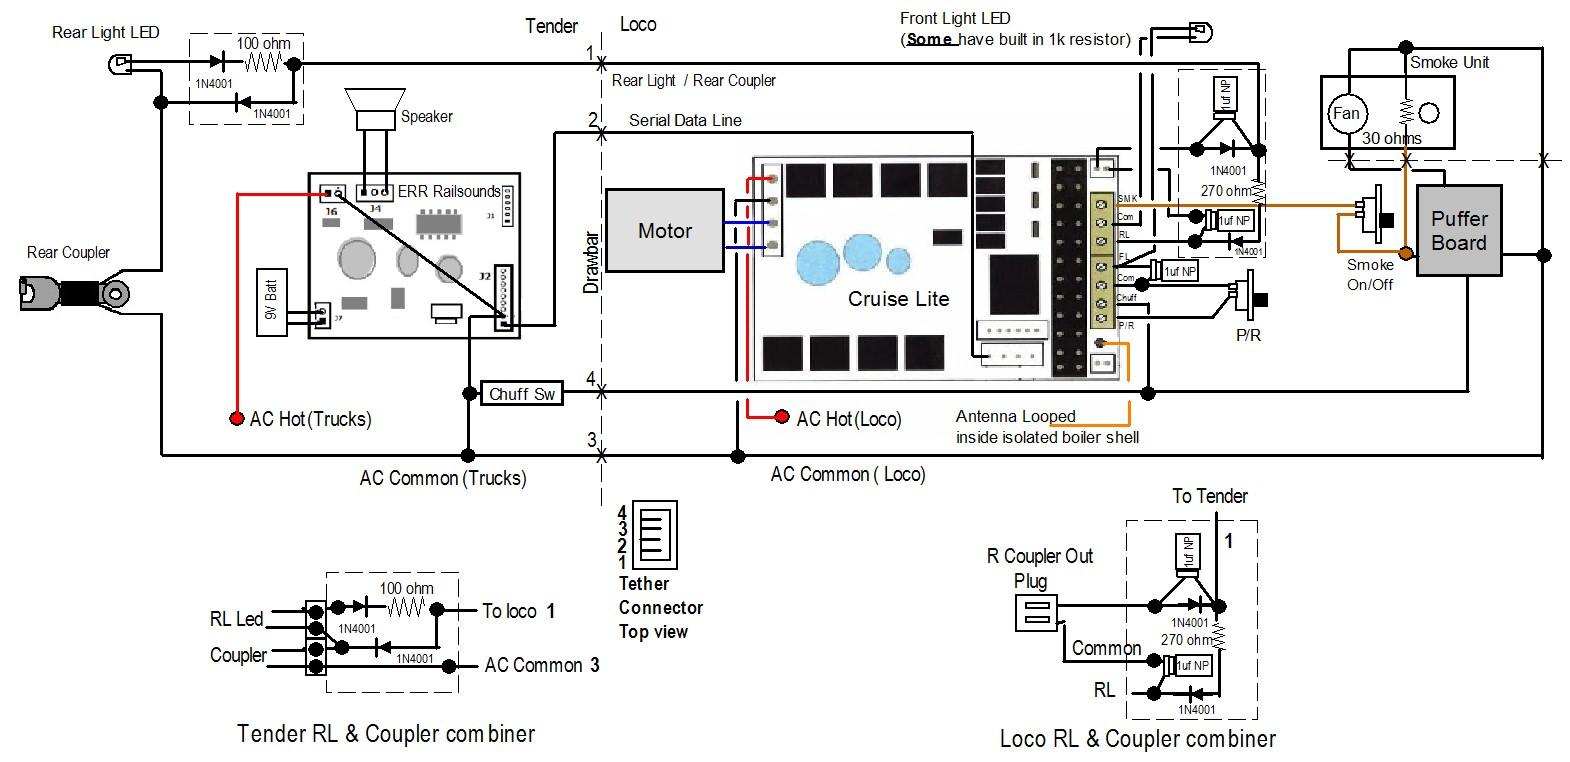 transformer wiring diagram for model trains